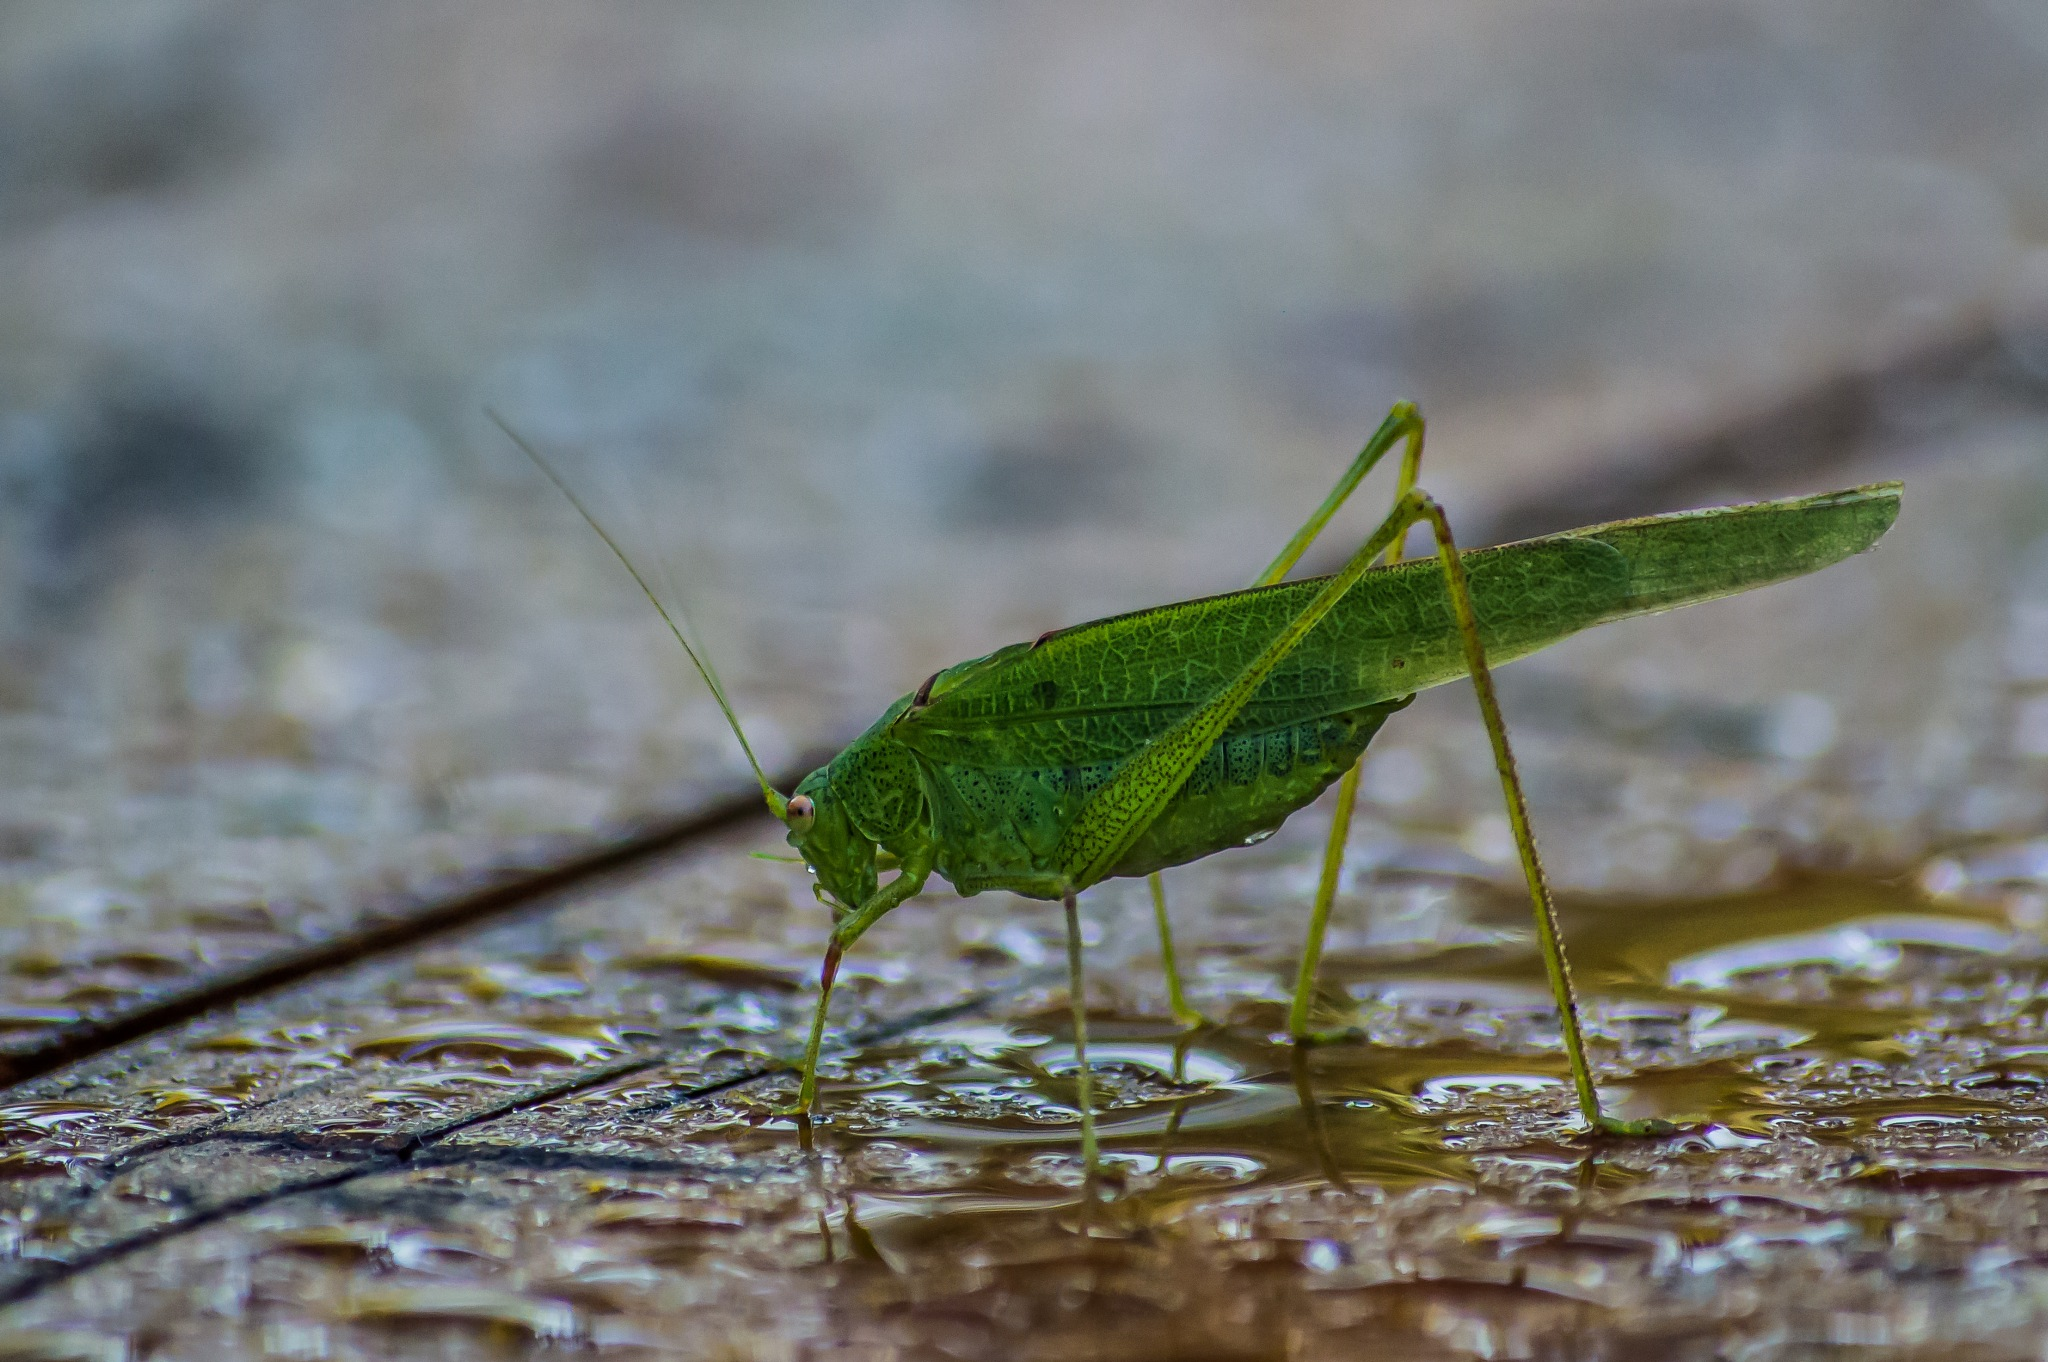 Grasshopper by Iulian Bud